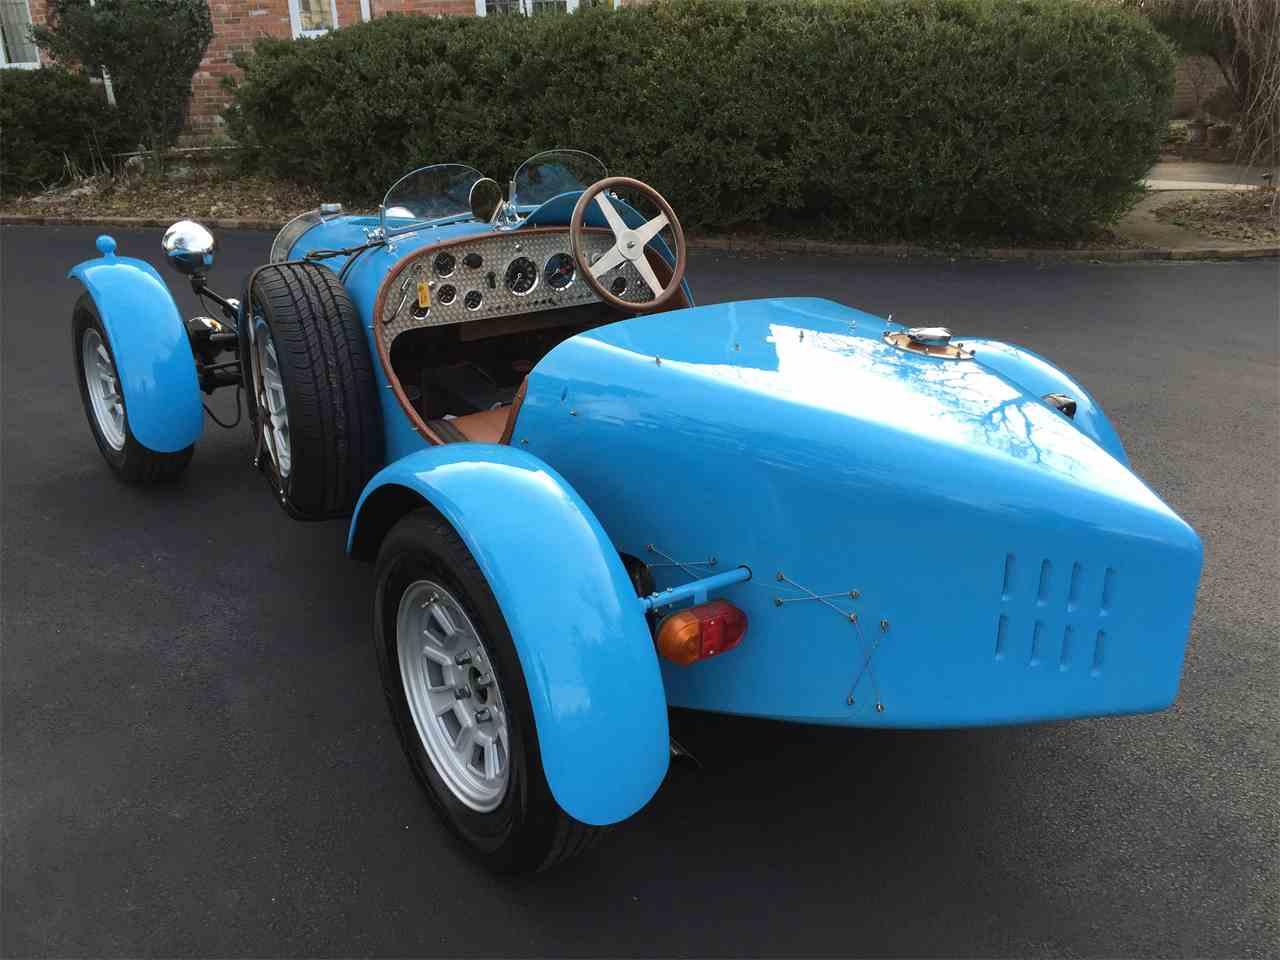 1971 bugatti type 37 replica factory built not a kit car for sale cc 963241. Black Bedroom Furniture Sets. Home Design Ideas